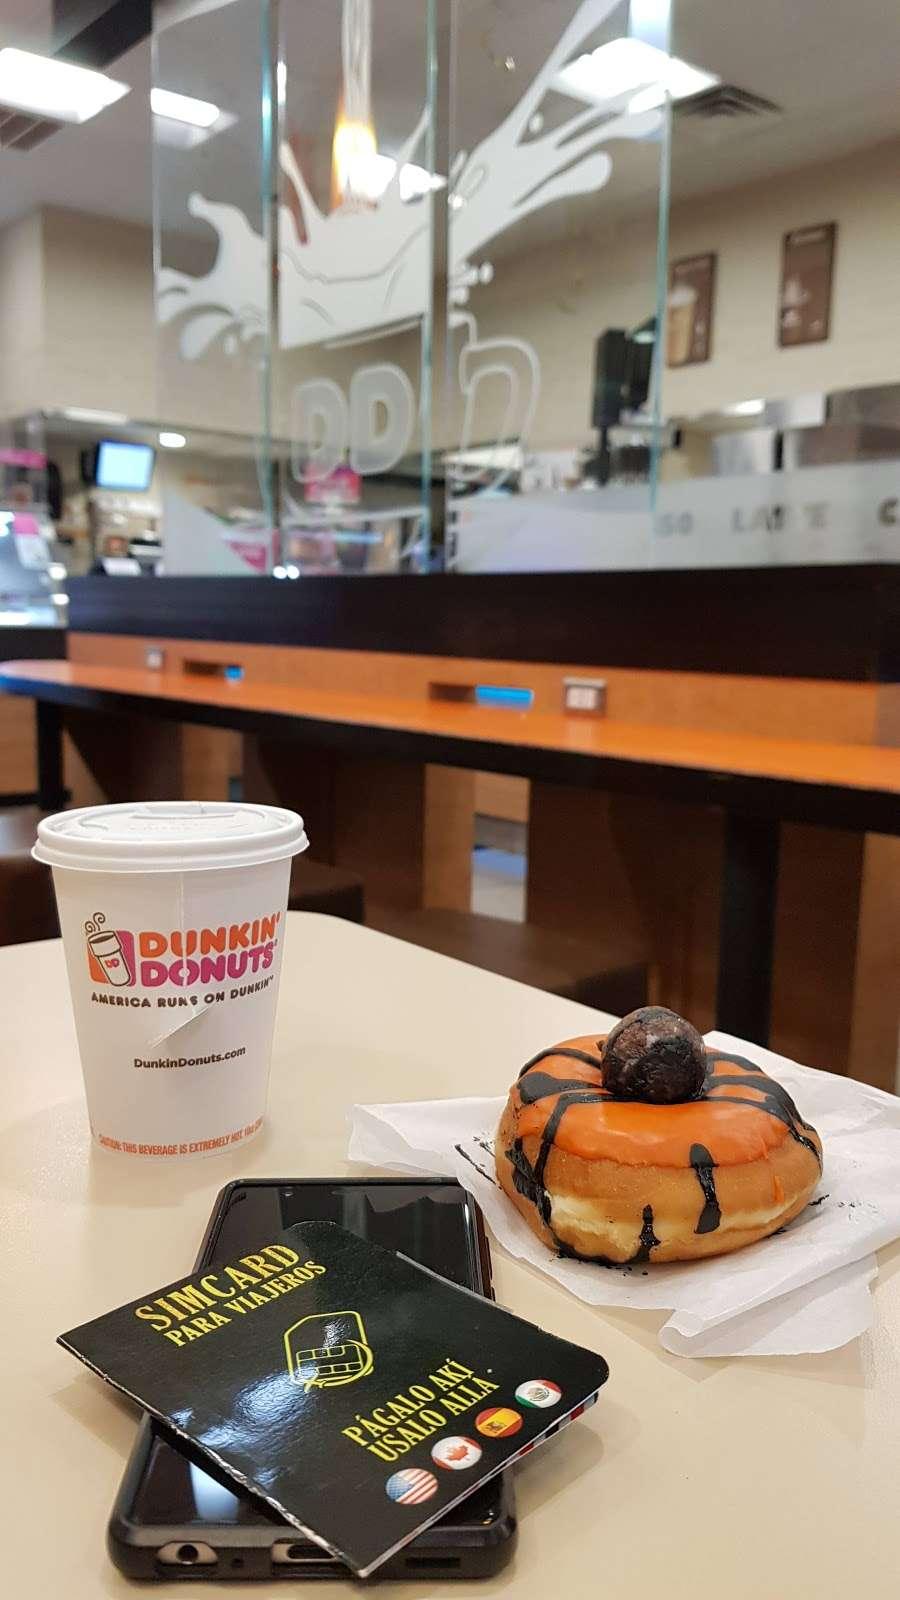 Dunkin Donuts - cafe  | Photo 1 of 10 | Address: 699 Avalon Drive, Wood-Ridge, NJ 07075, USA | Phone: (201) 203-1866